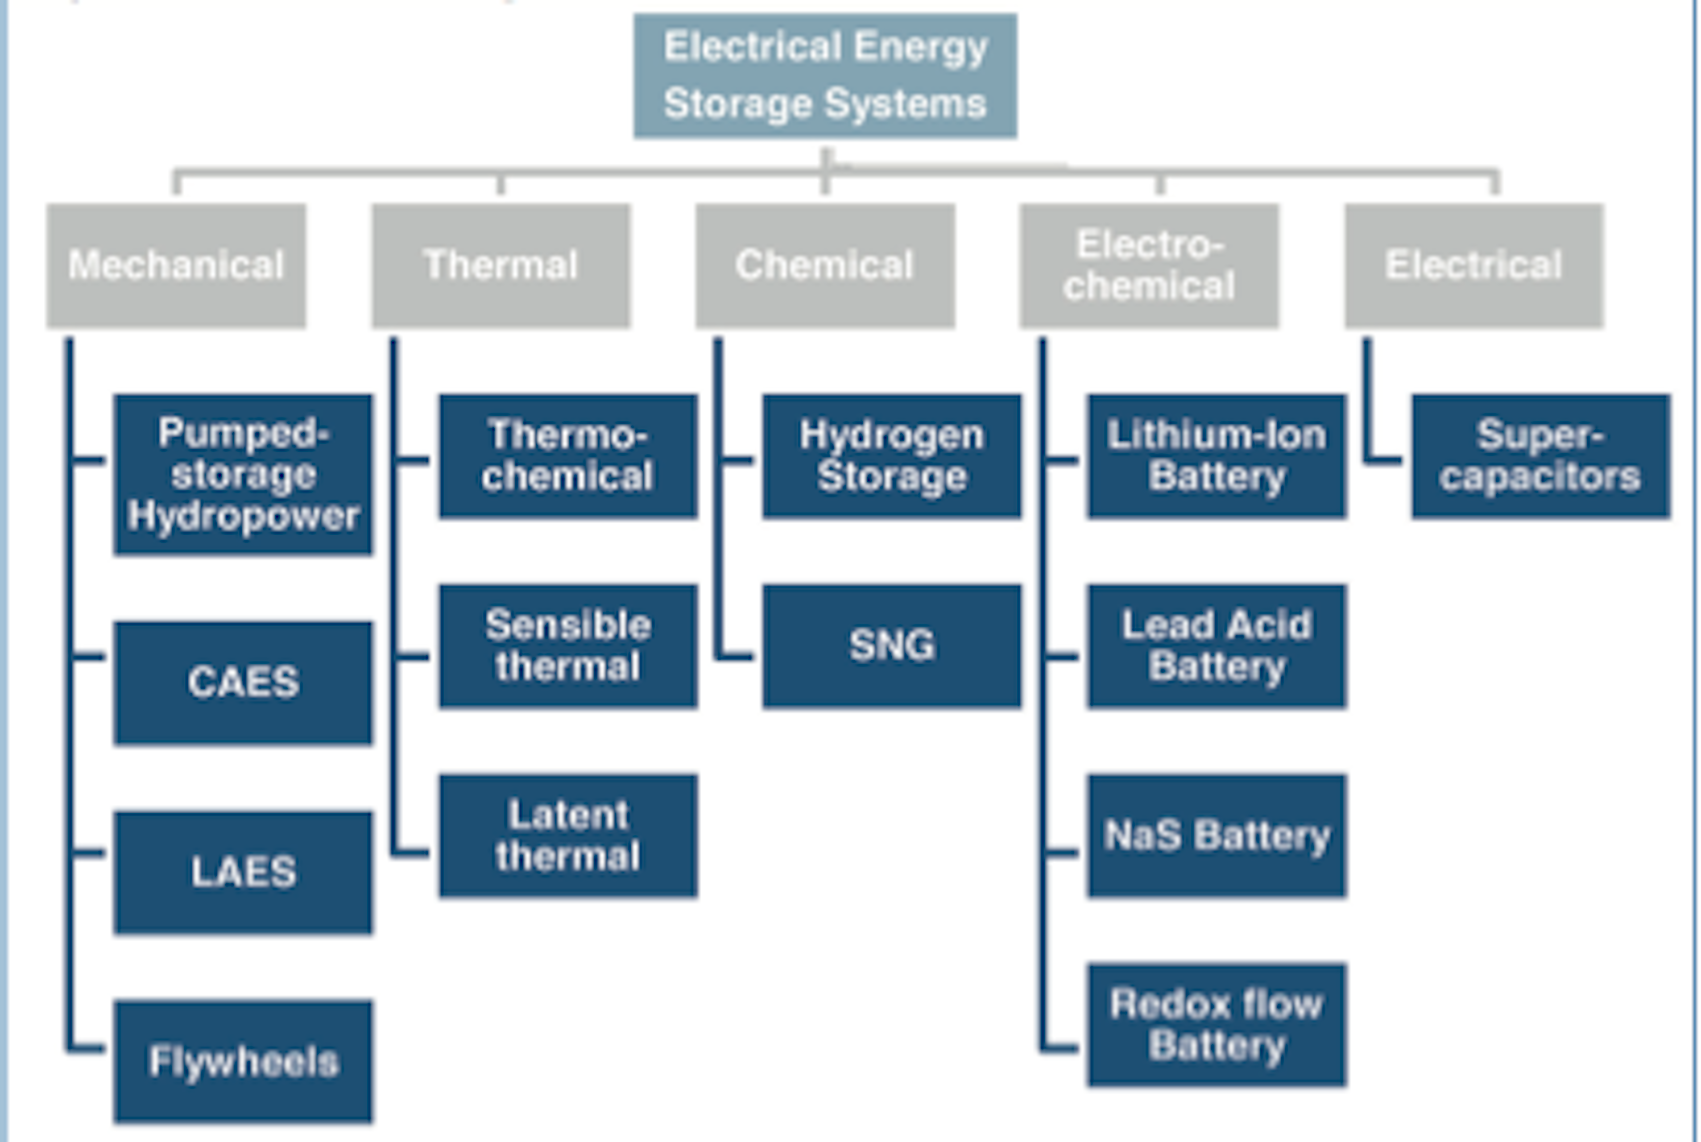 Categorisation of storage technologies  From WEC, E-storage